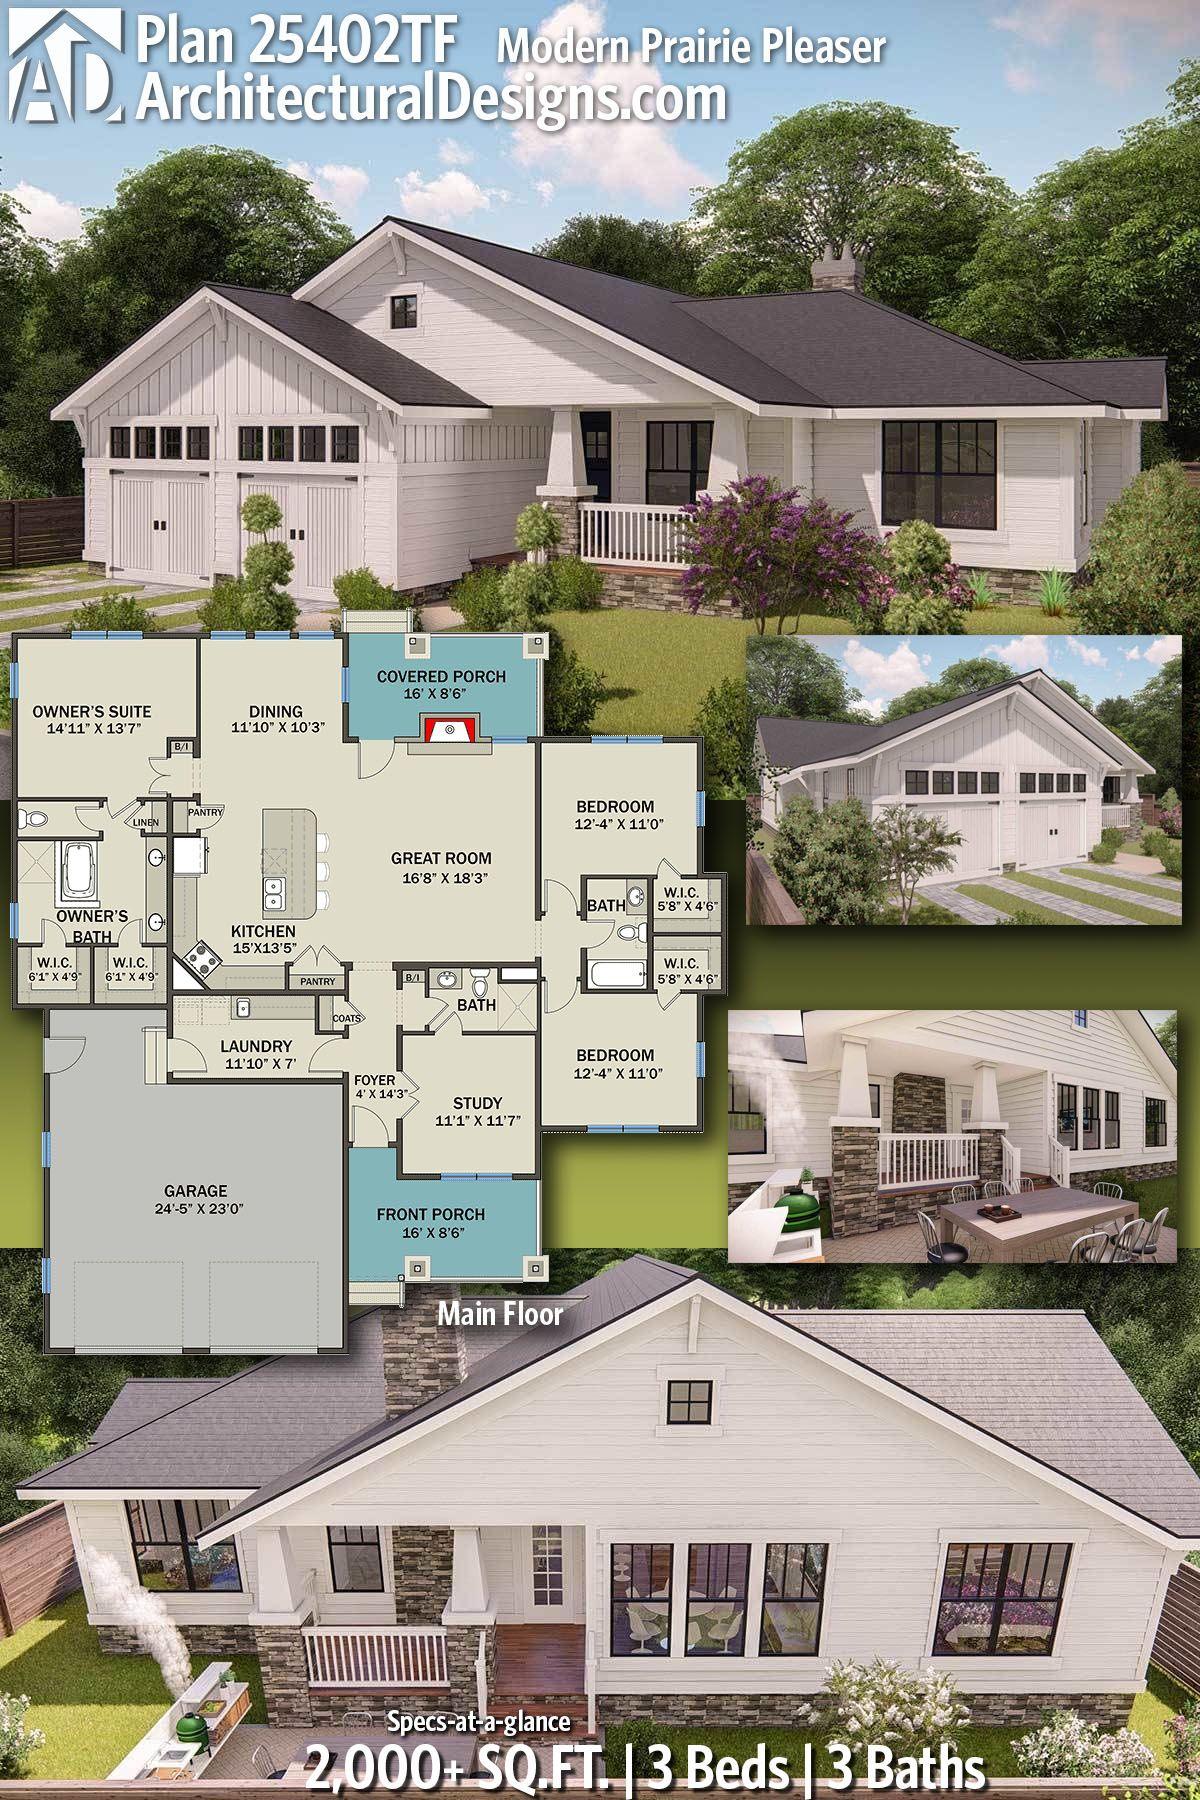 Plan 25402tf Modern Prairie Pleaser Ranch House Plans House Plans House Blueprints